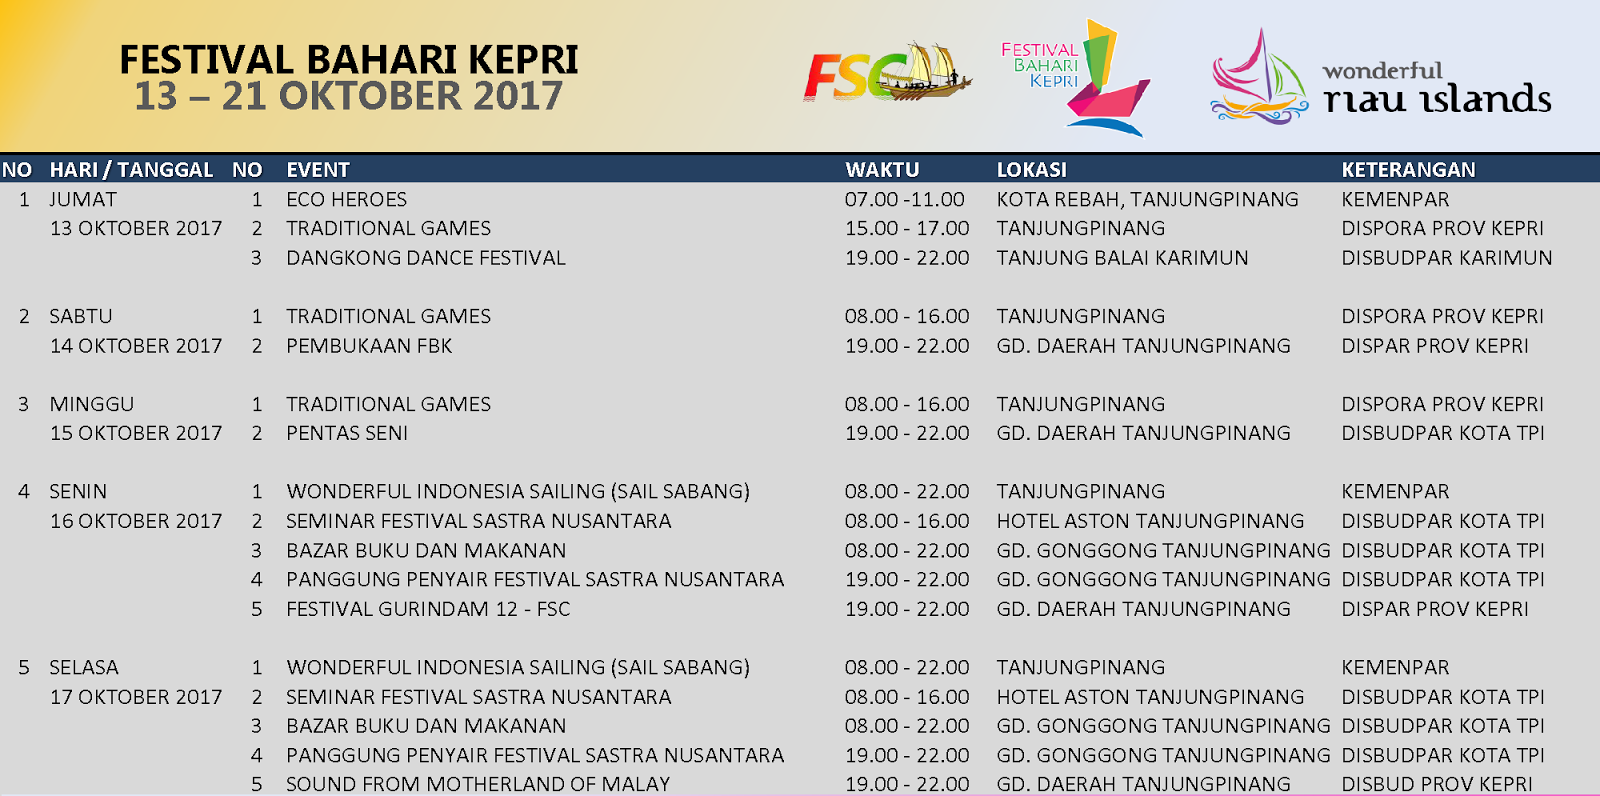 Festival Bahari Kepri 2017